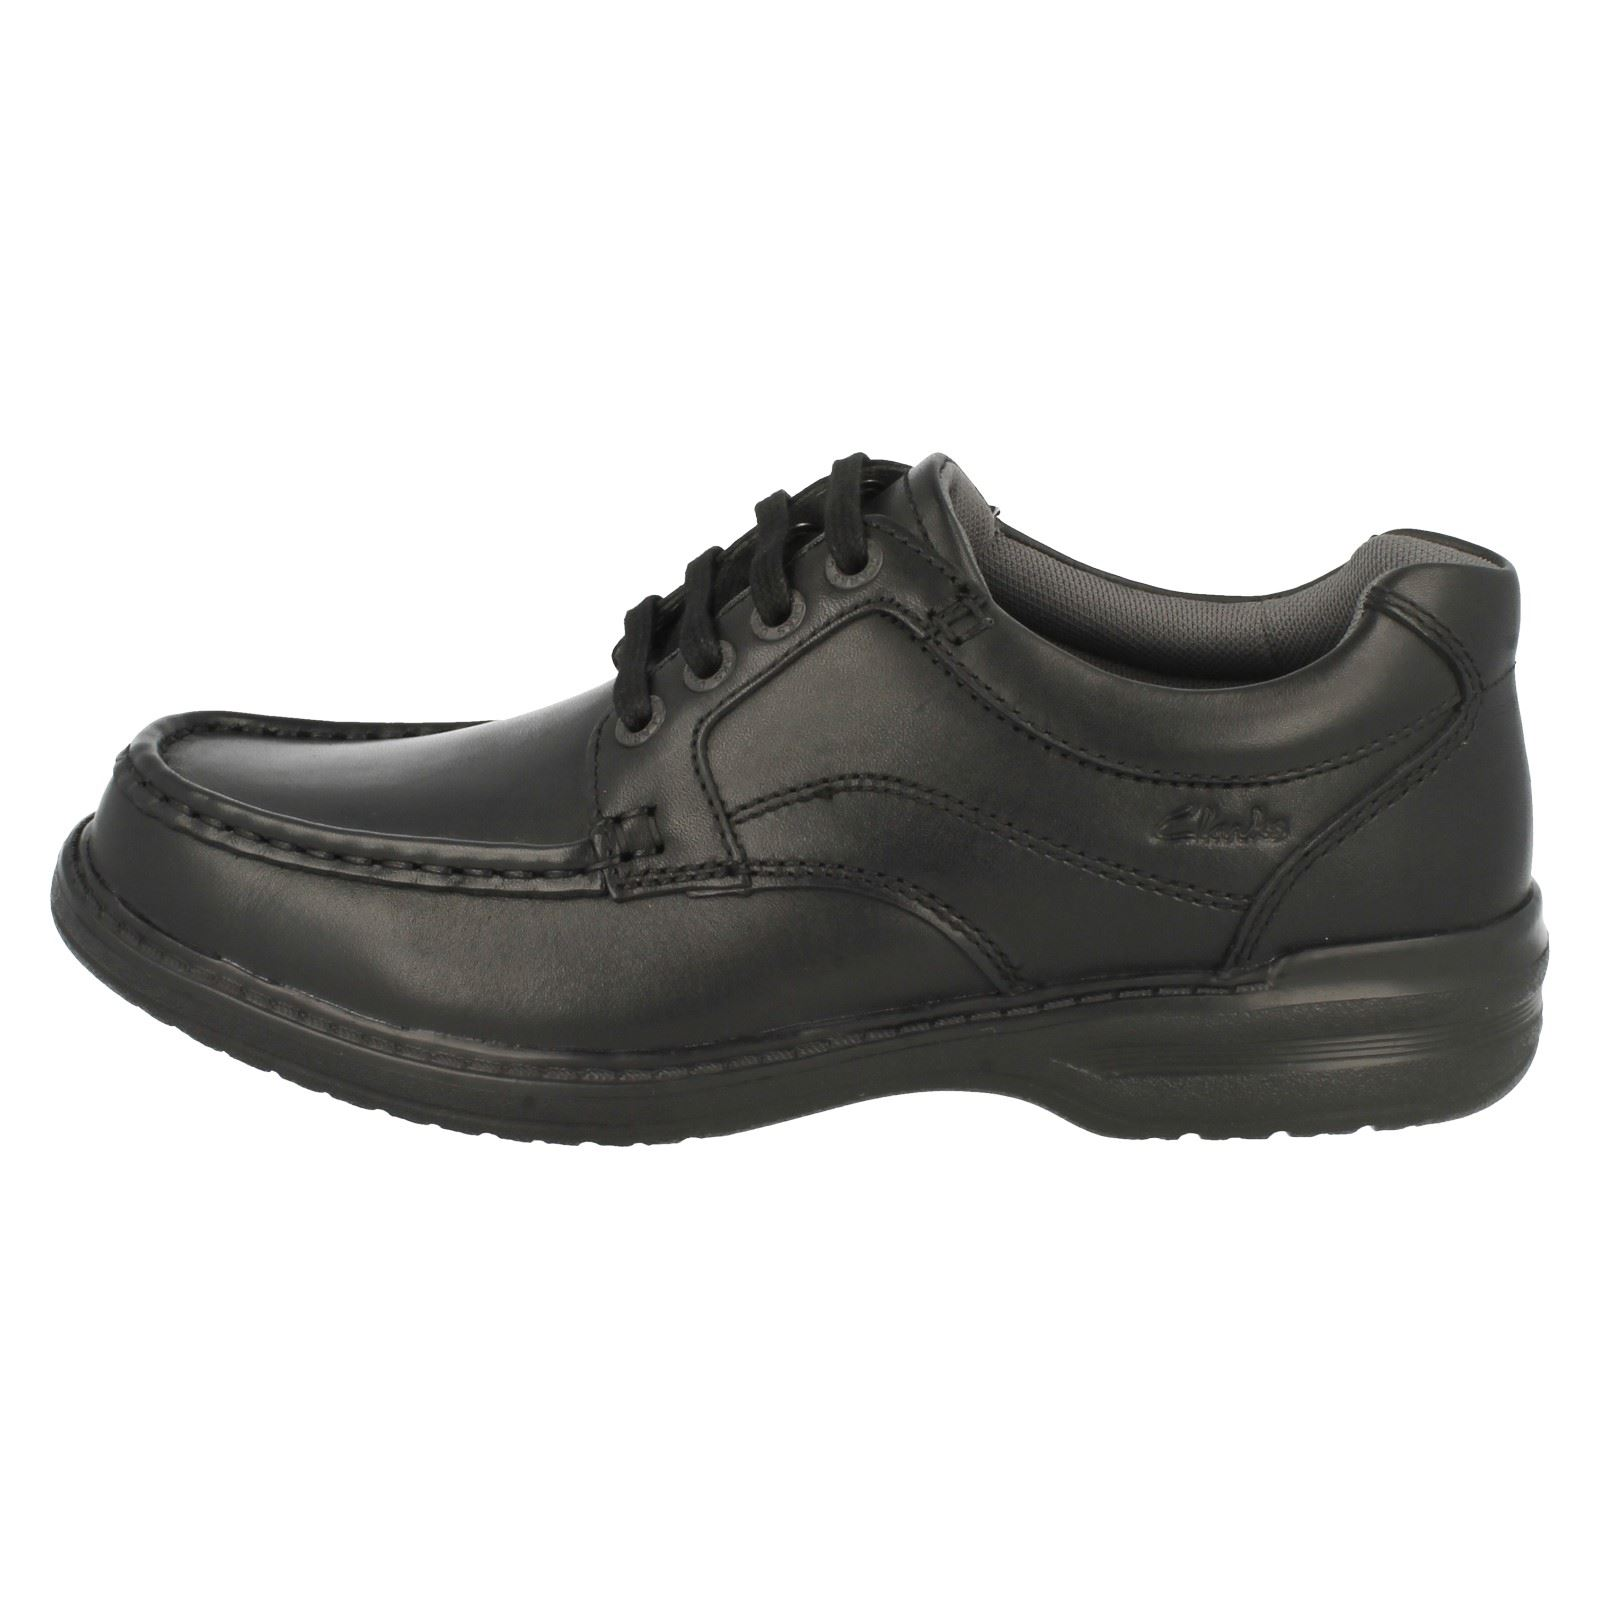 Mens Clarks Casual Shoes *Keeler Walk*